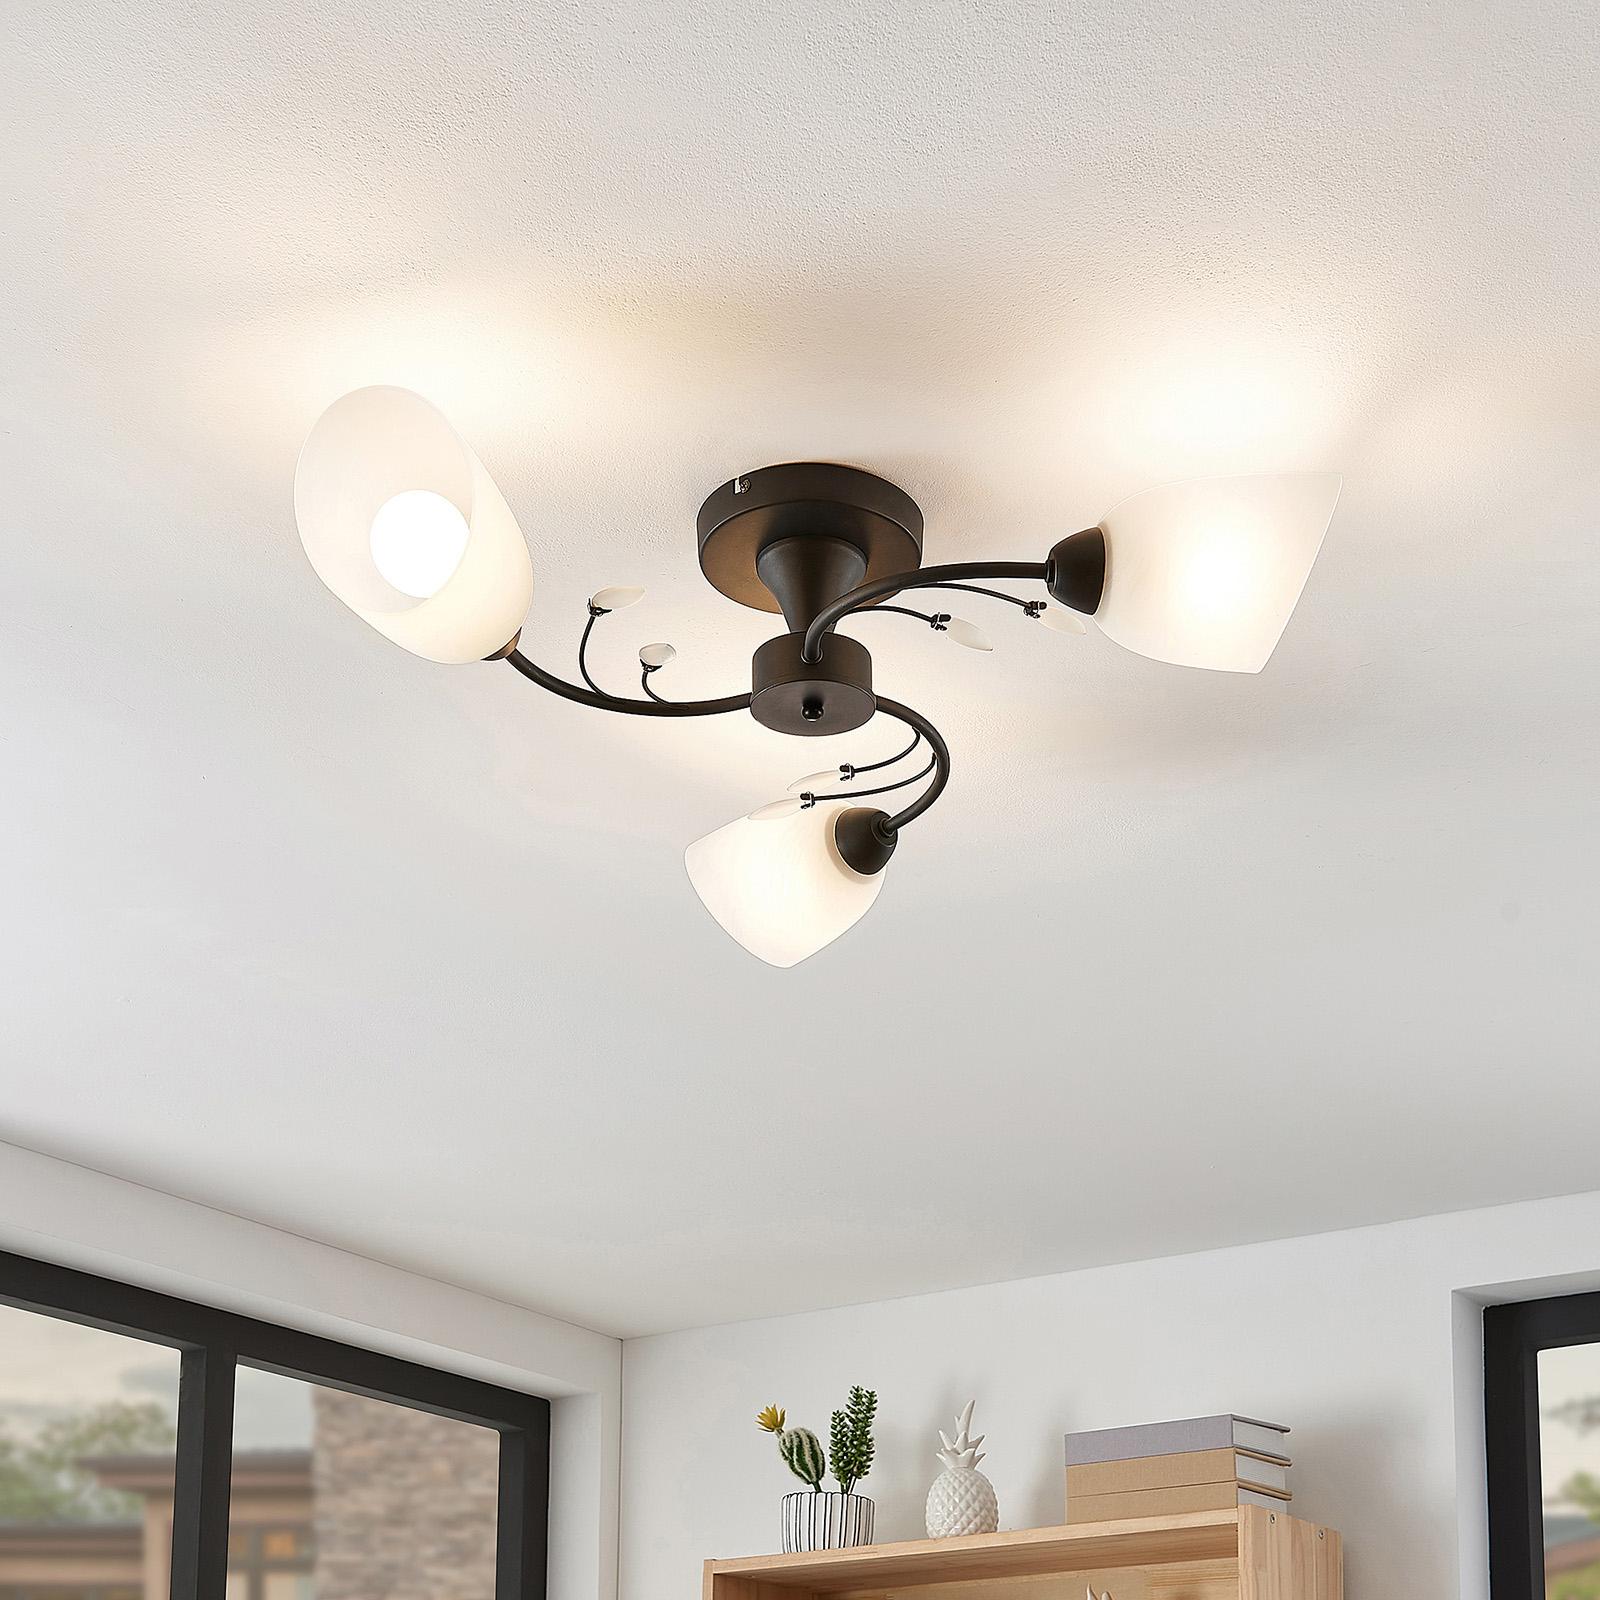 Lindby Amgad taklampe, 3 lyskilder